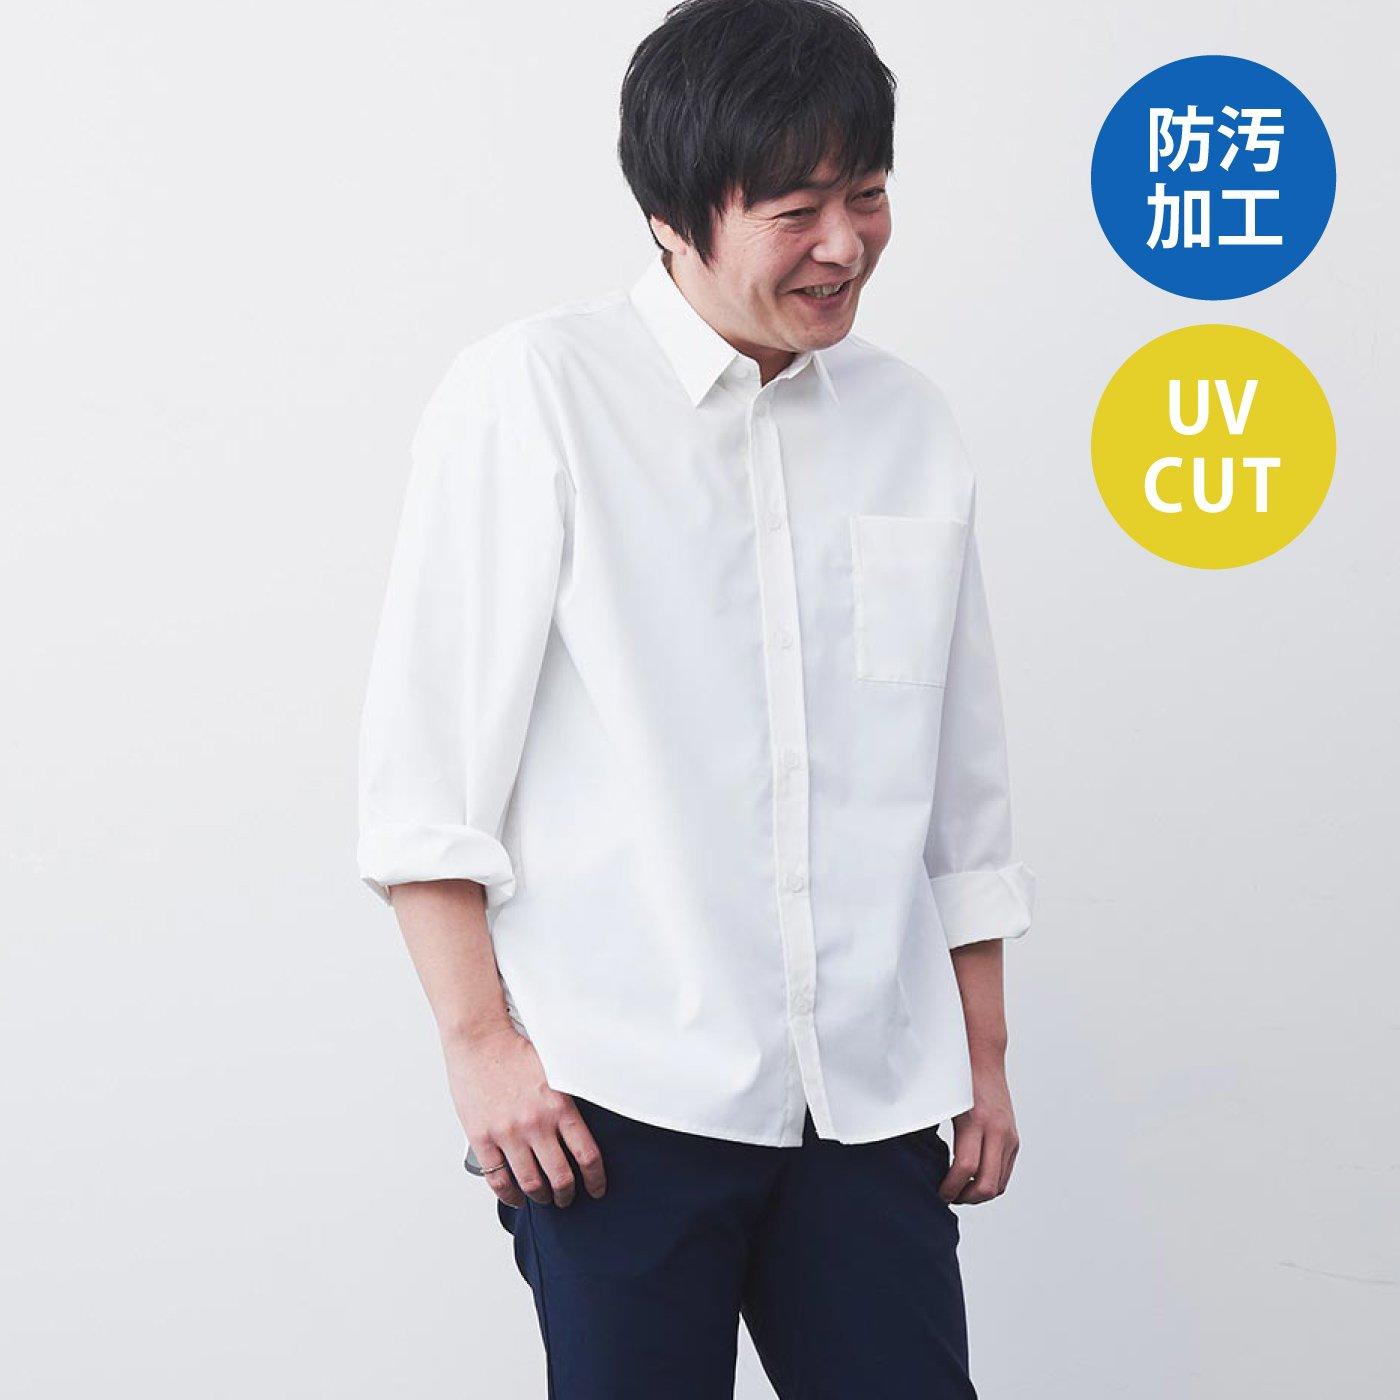 IEDIT[イディット] クレバー素材のメンズシャツ〈オフホワイト〉